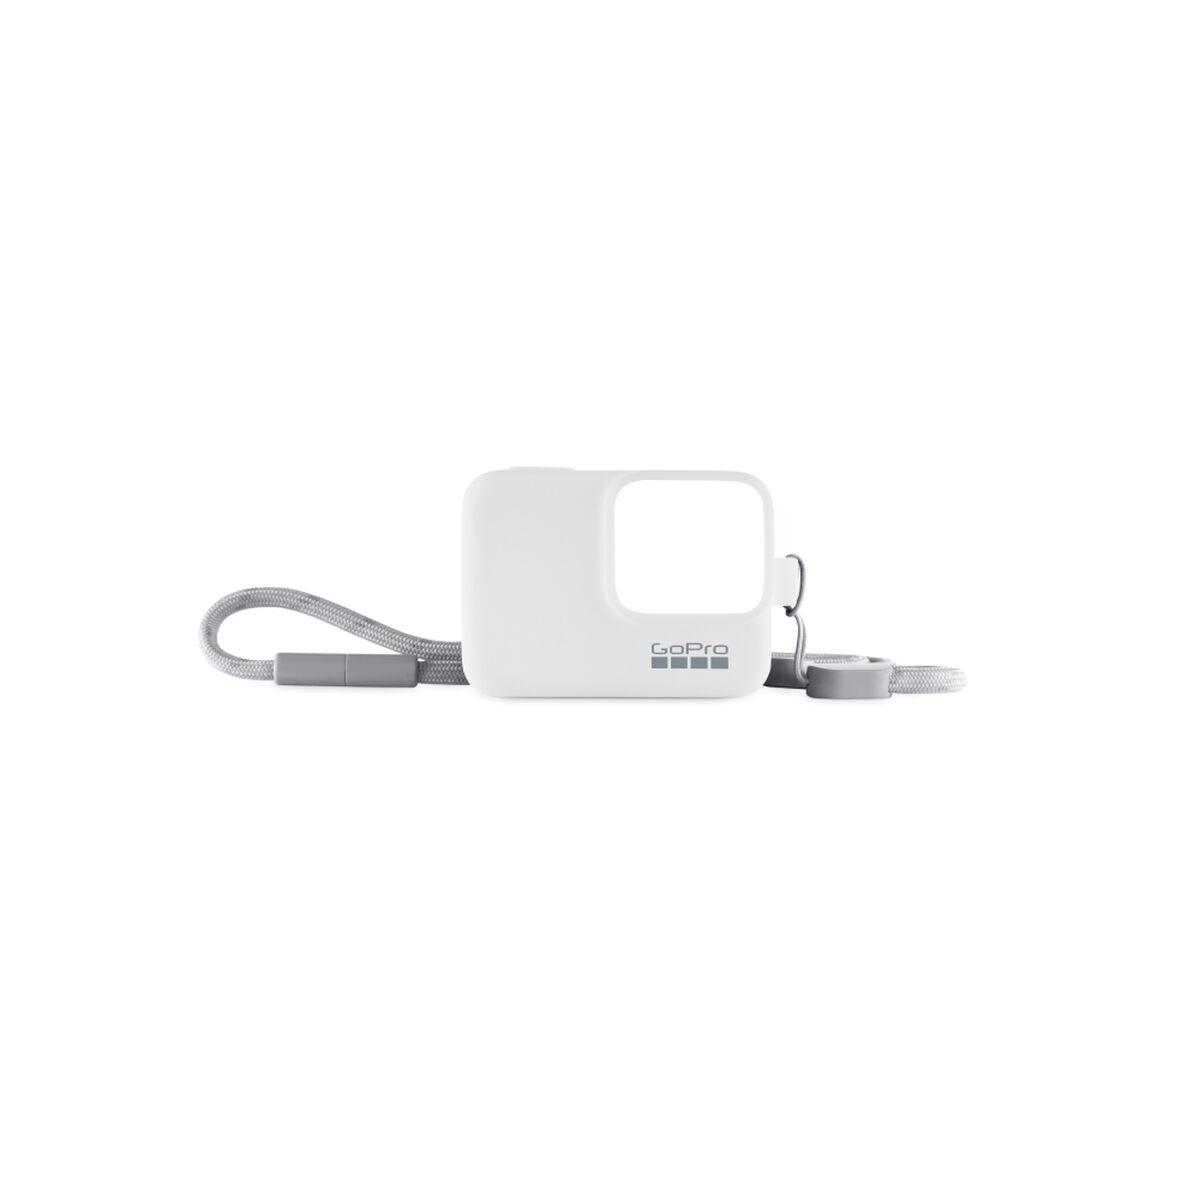 Funda de Silicona + Cordón Blanco para GoPro HERO7